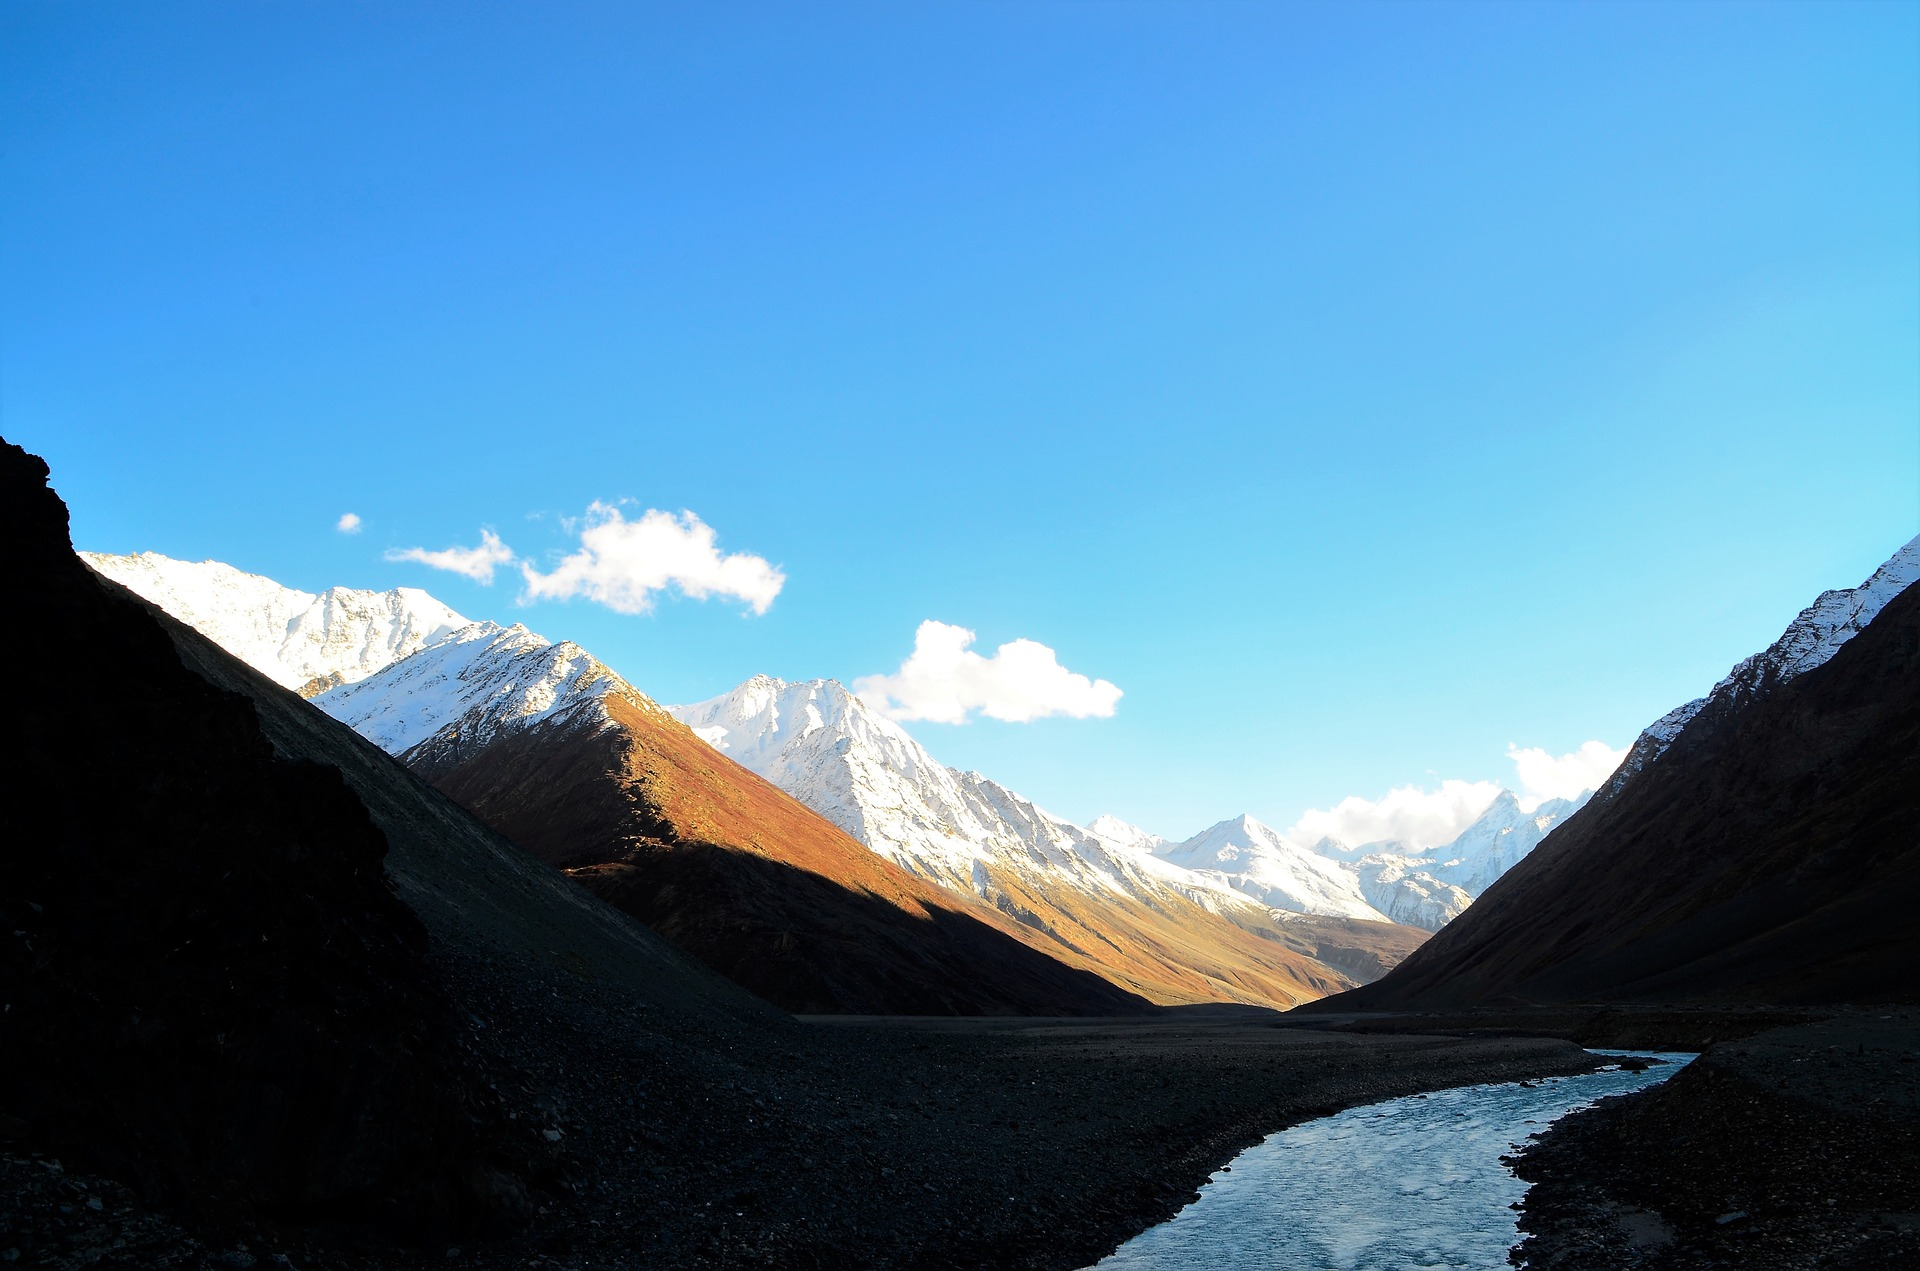 Himachal Pradesh – An Astounding Tourist Destination